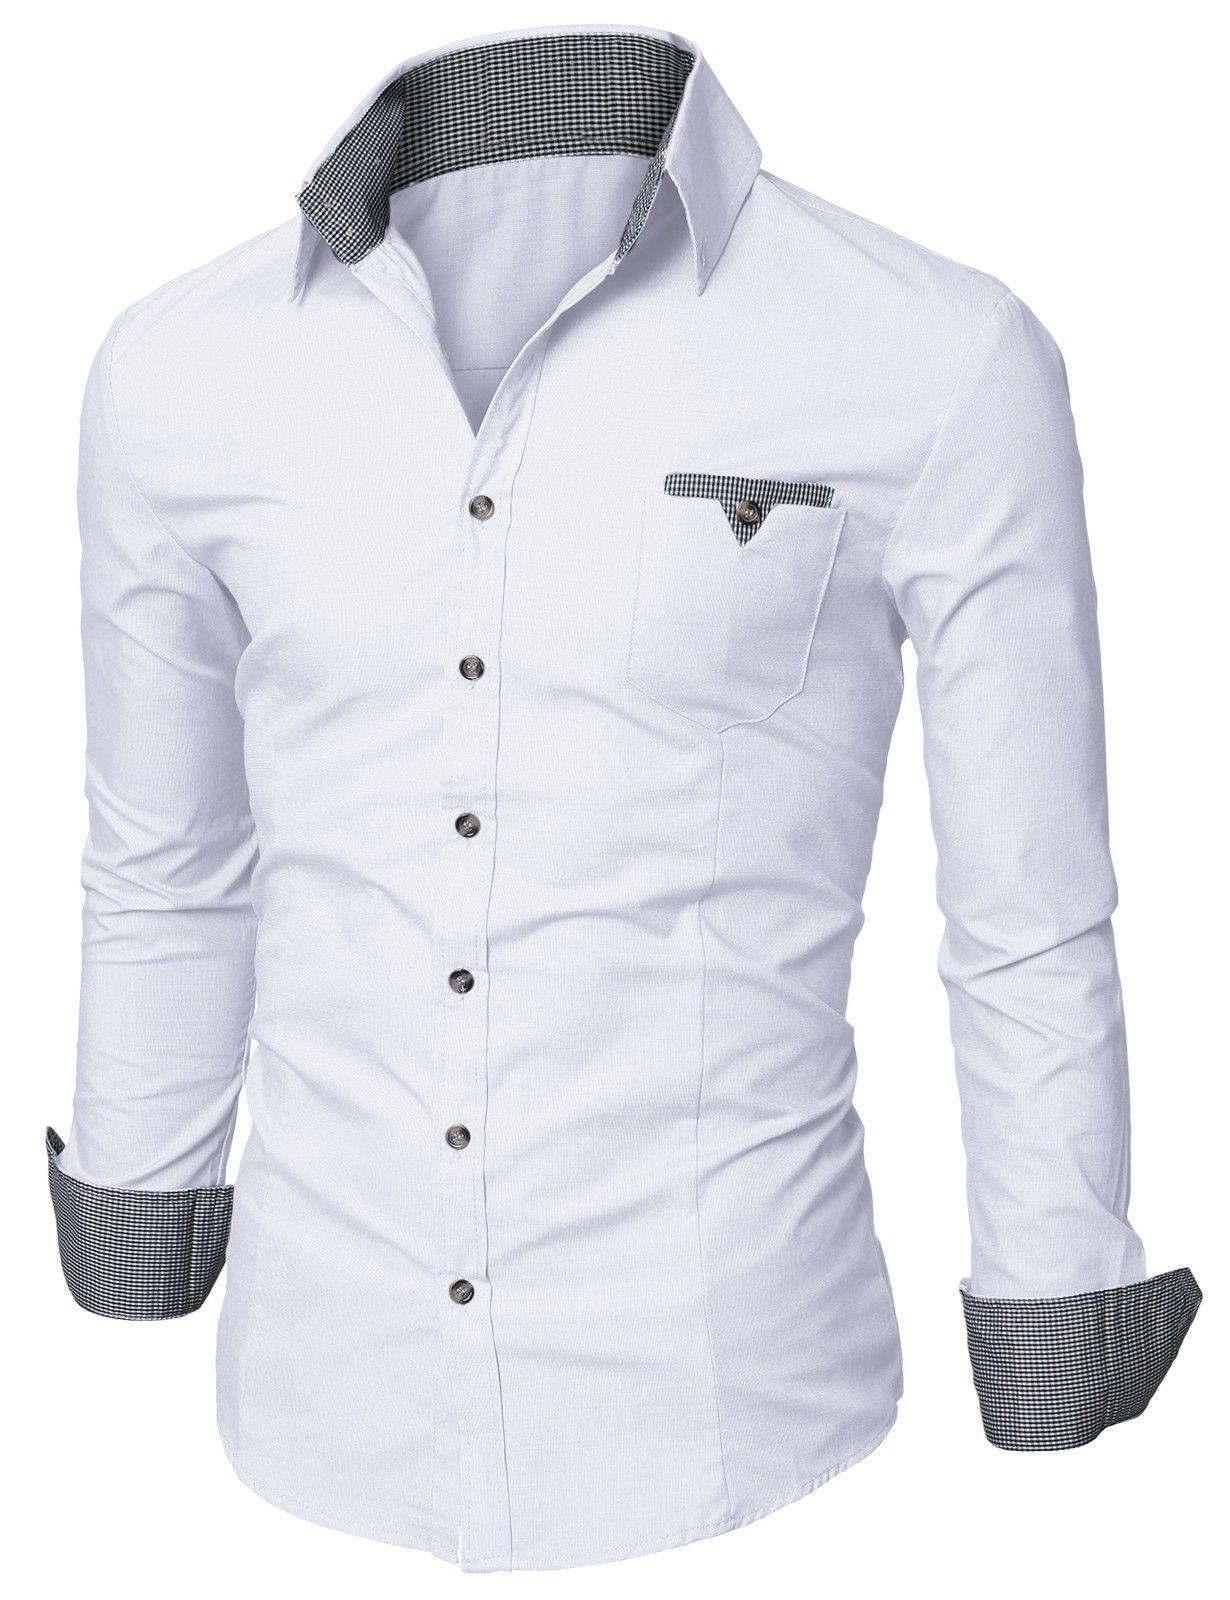 Mens white casual dress shirts